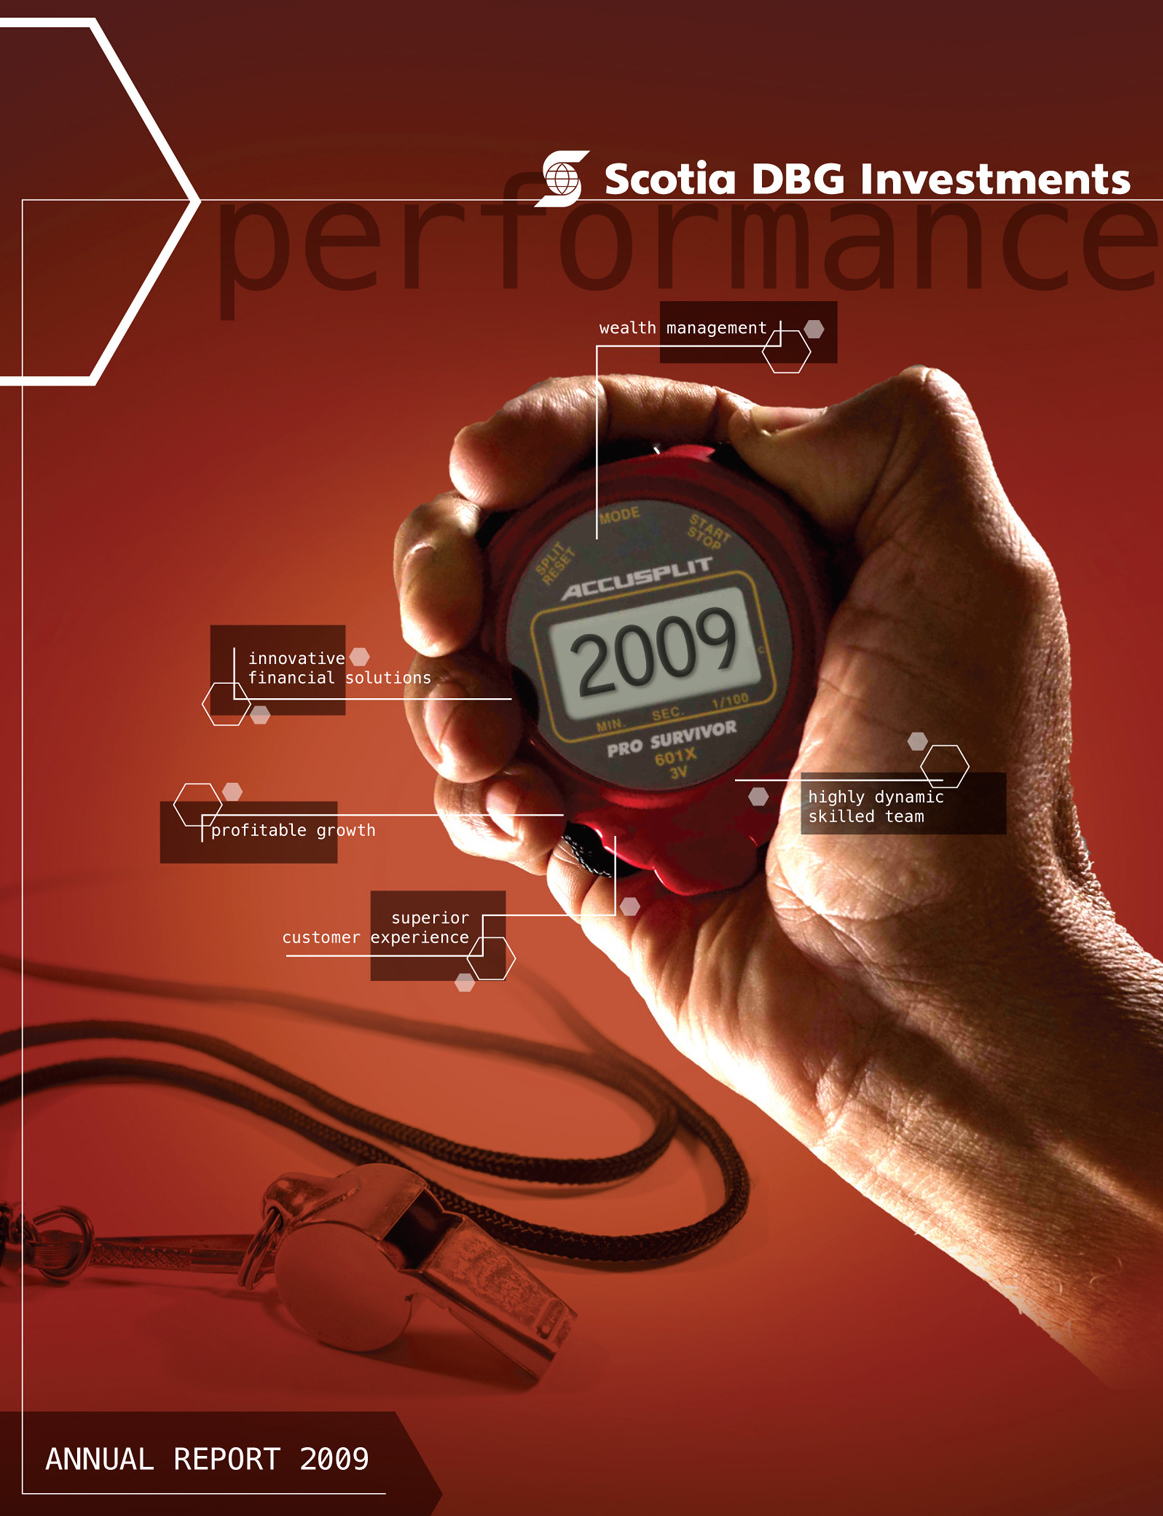 SDBG-cover-2009.jpg